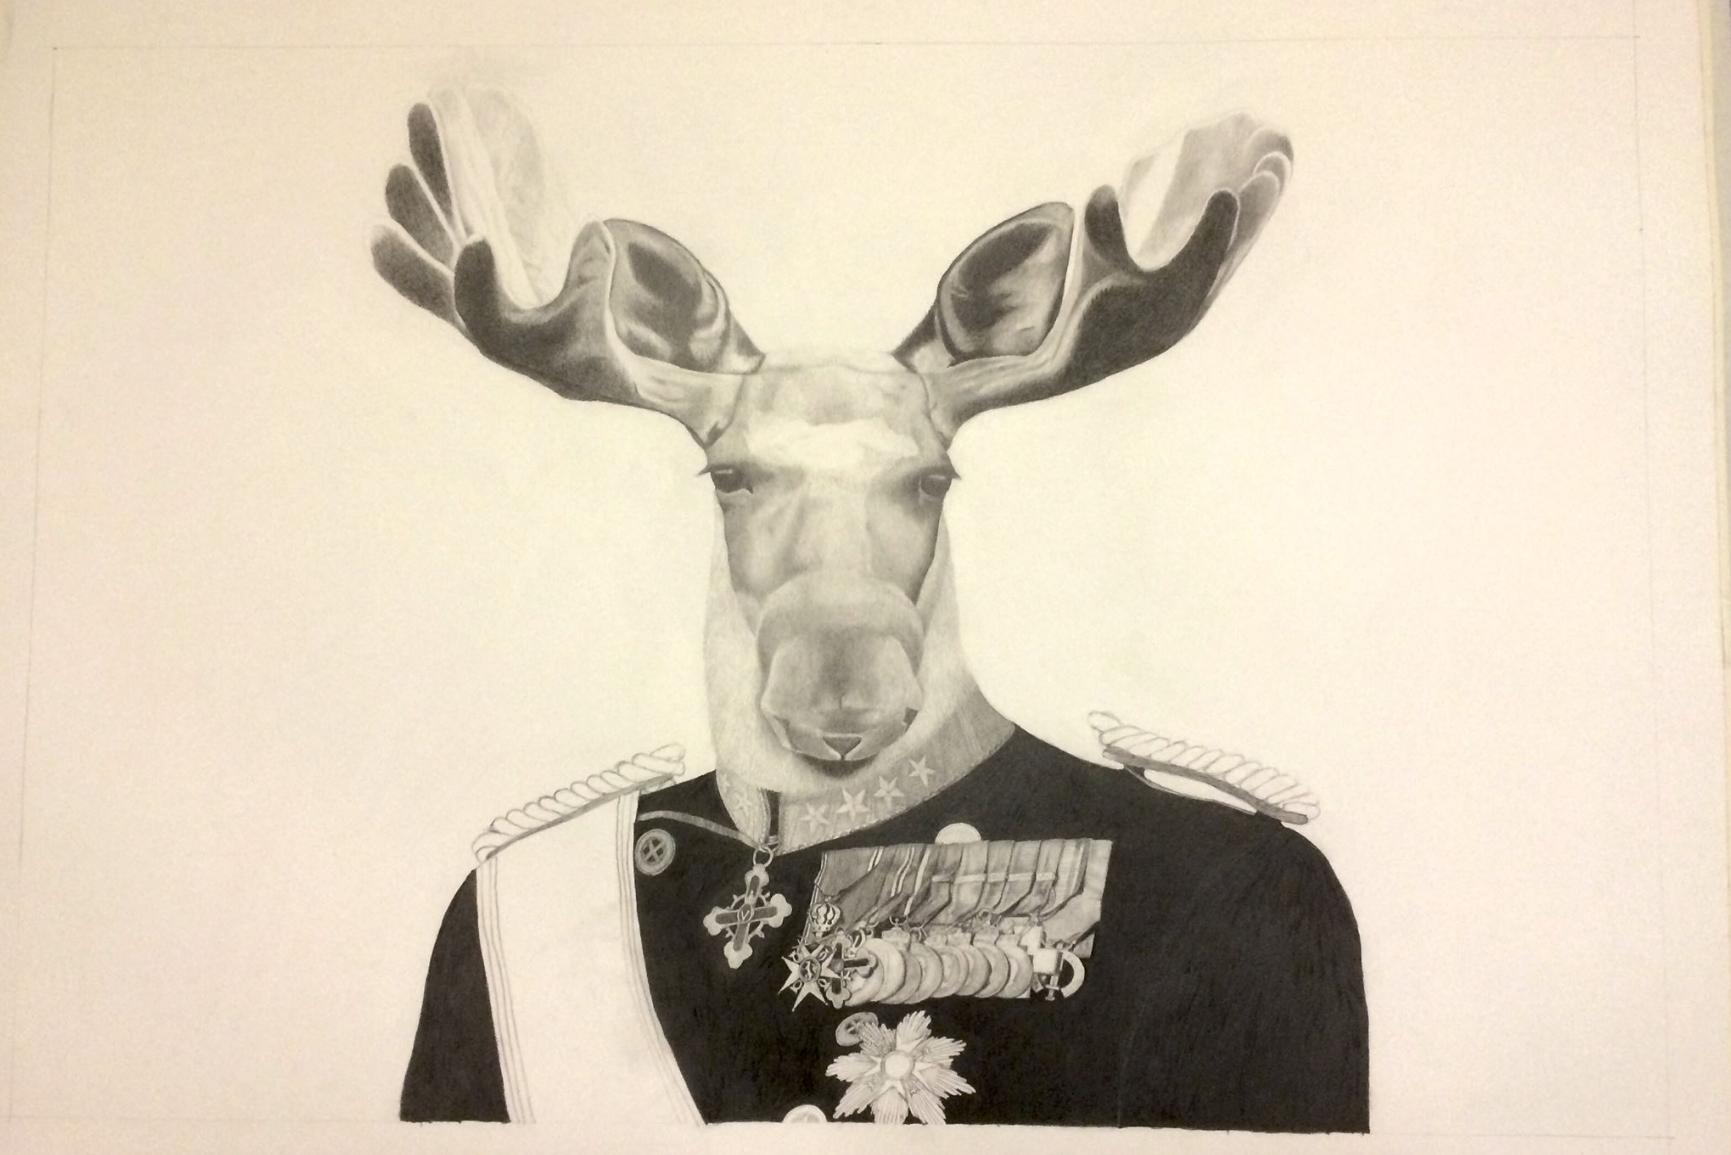 Billedkunstner Johan Ask Vikse